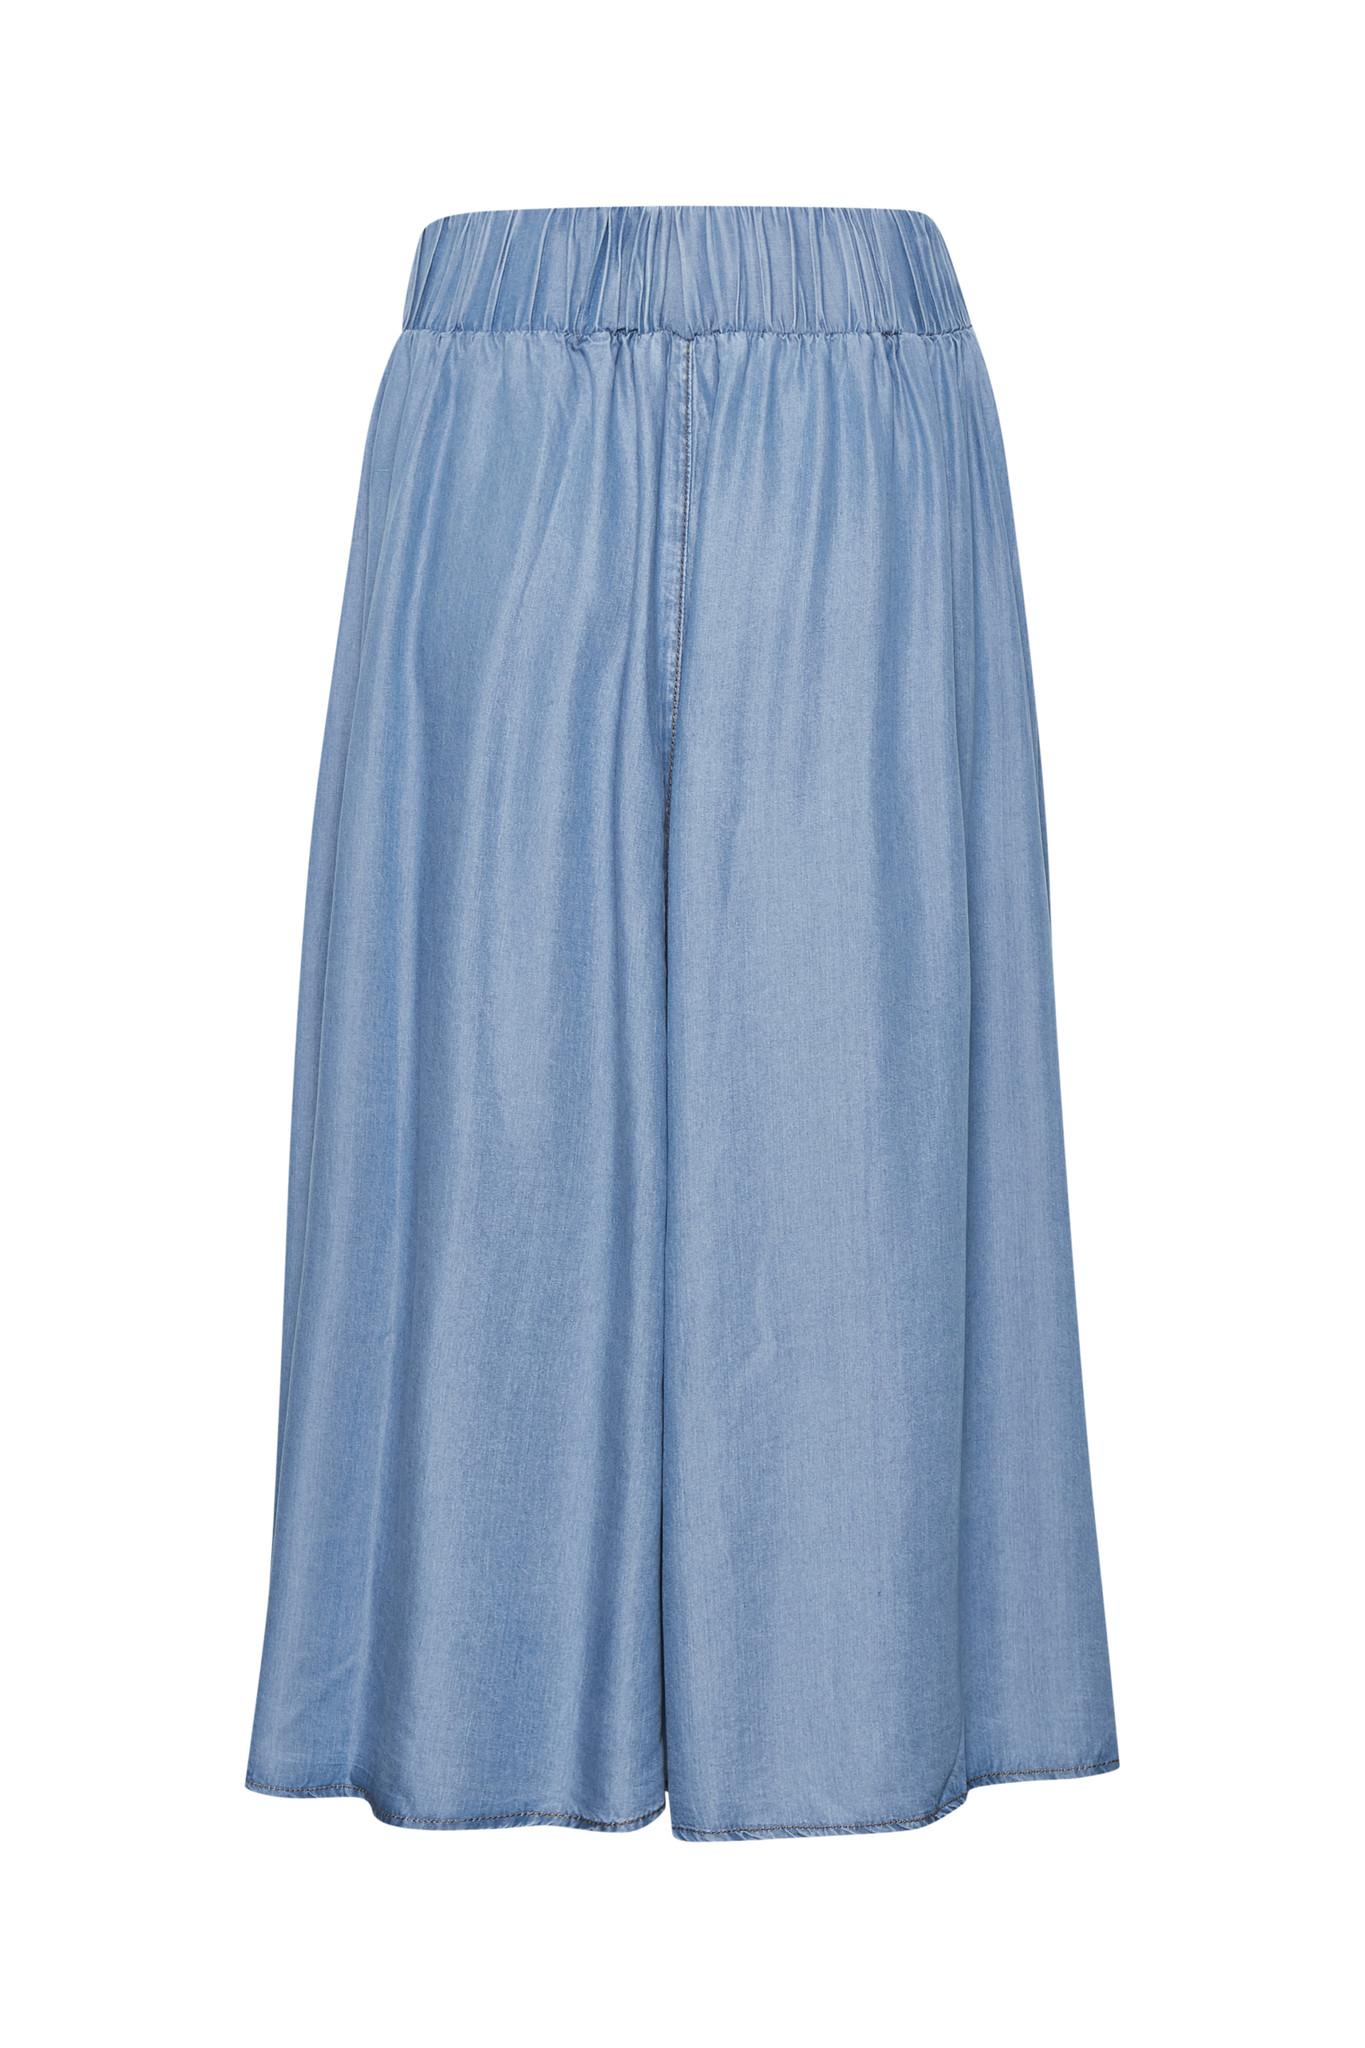 Rok EsterCR Skirt Denim Blue-5